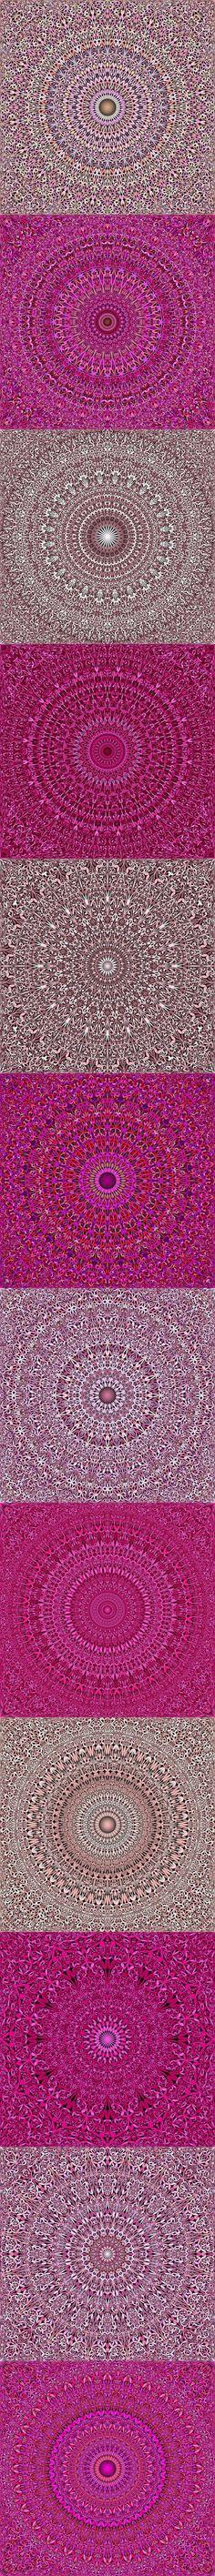 Buy 12 Pink Floral Mandala Seamless Patterns by DavidZydd on GraphicRiver. 12 seamless floral mandala pattern backgrounds in pink tones DETAILS: 12 JPG (RGB files) size: 12 geometr. Flower Pattern Design, Flower Designs, Mandala Pattern, Mandala Design, Pink Patterns, Flower Patterns, Flower Wallpaper, Pattern Wallpaper, 3d Fantasy